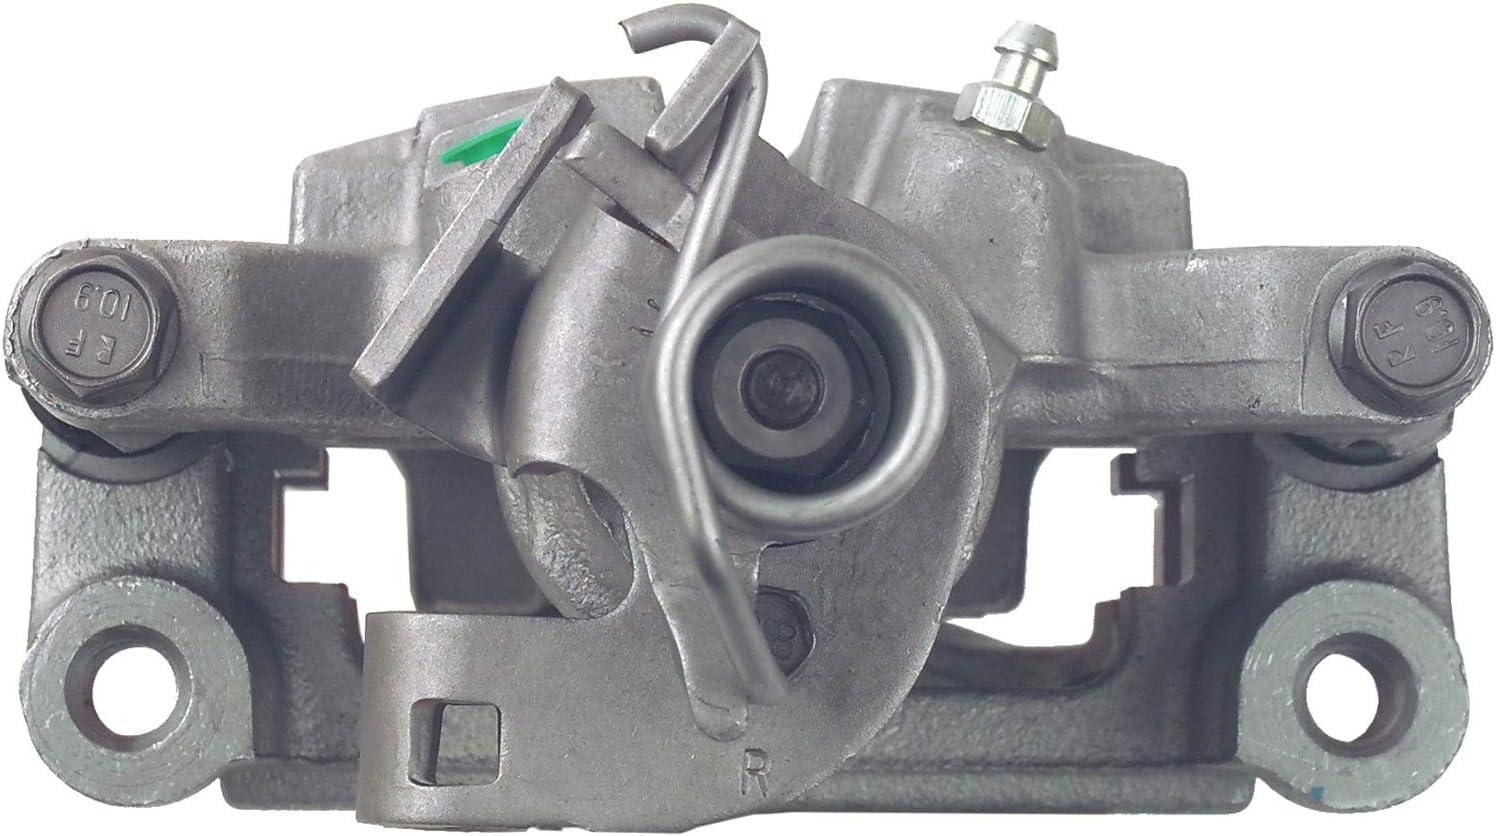 Cardone 18-B5011 Remanufactured Unloaded Disc Brake Caliper with Bracket